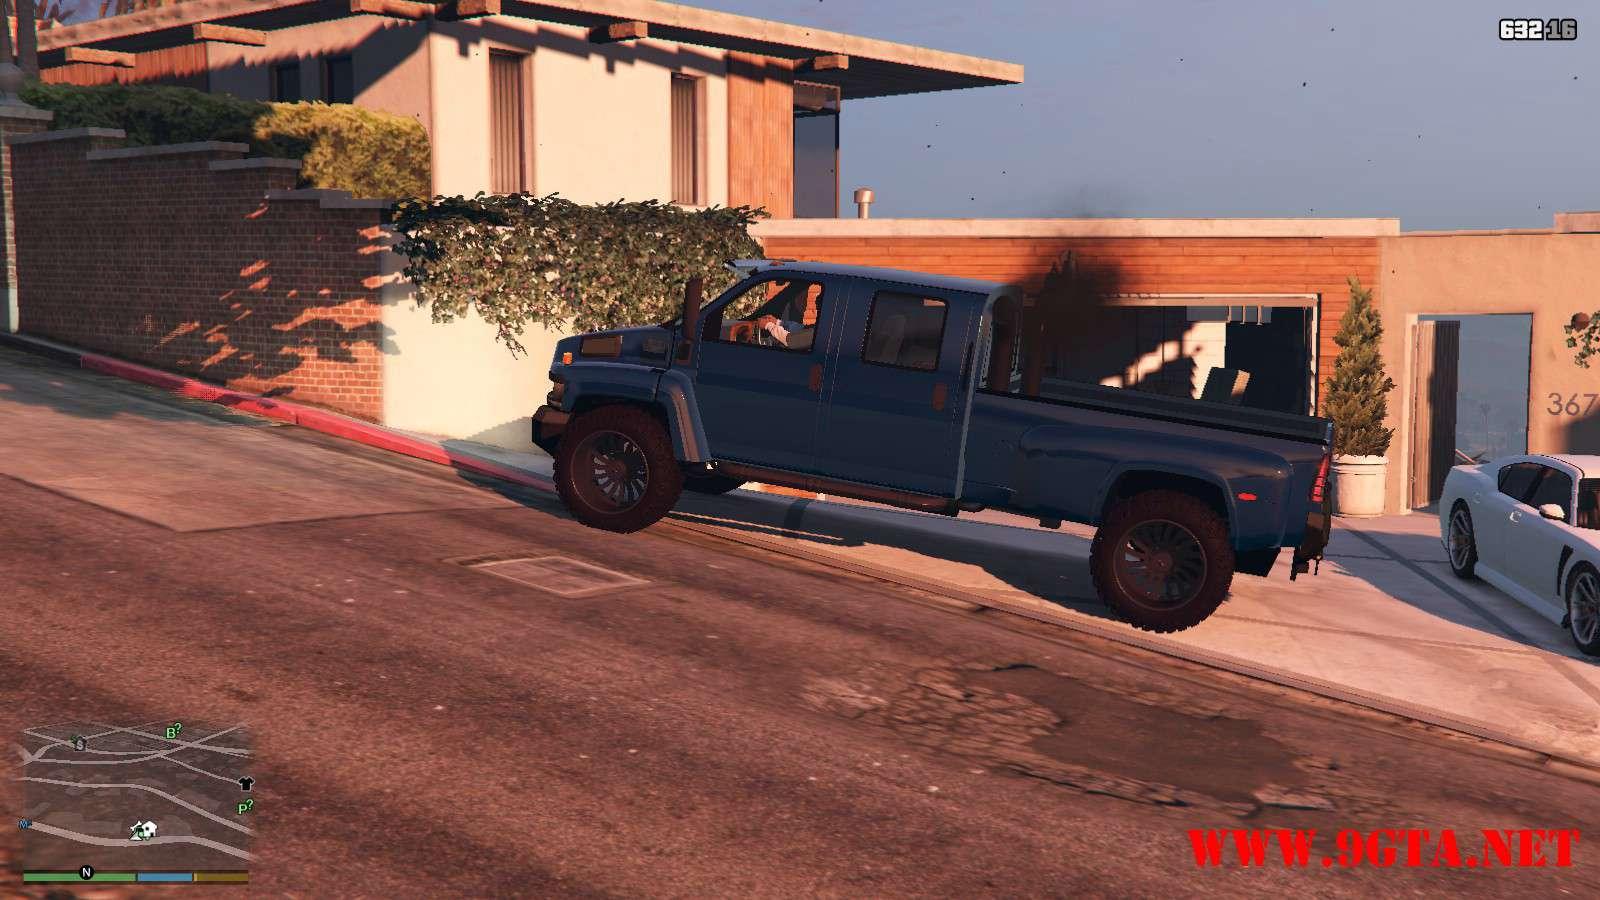 2009 GMC Topkick Truck GTA5 Mods (13)